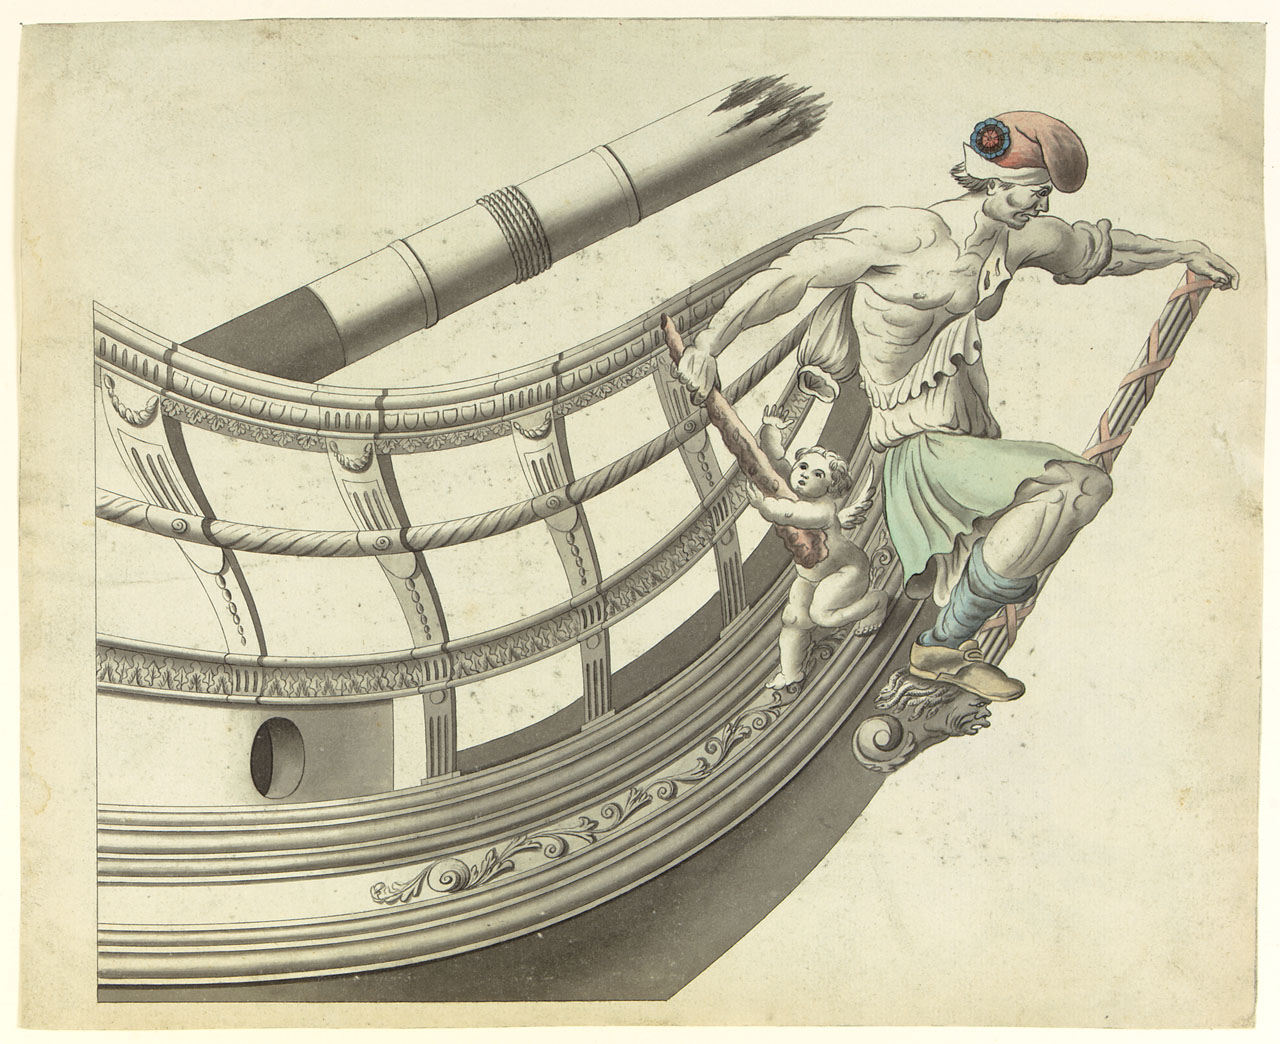 Drawn ship figurehead With it  San aid